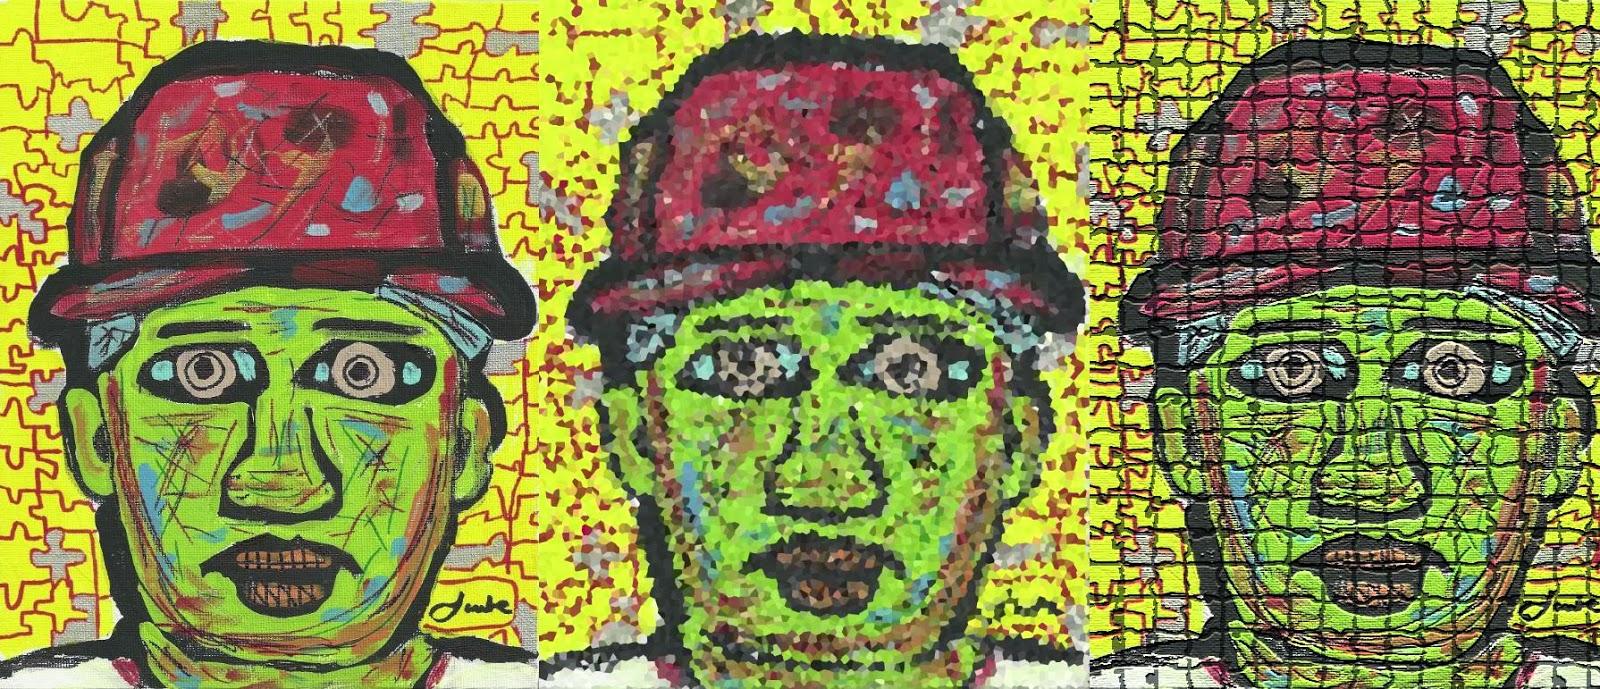 2014 | Justin Lacche | The Right Fielder, The Puzzle Piece